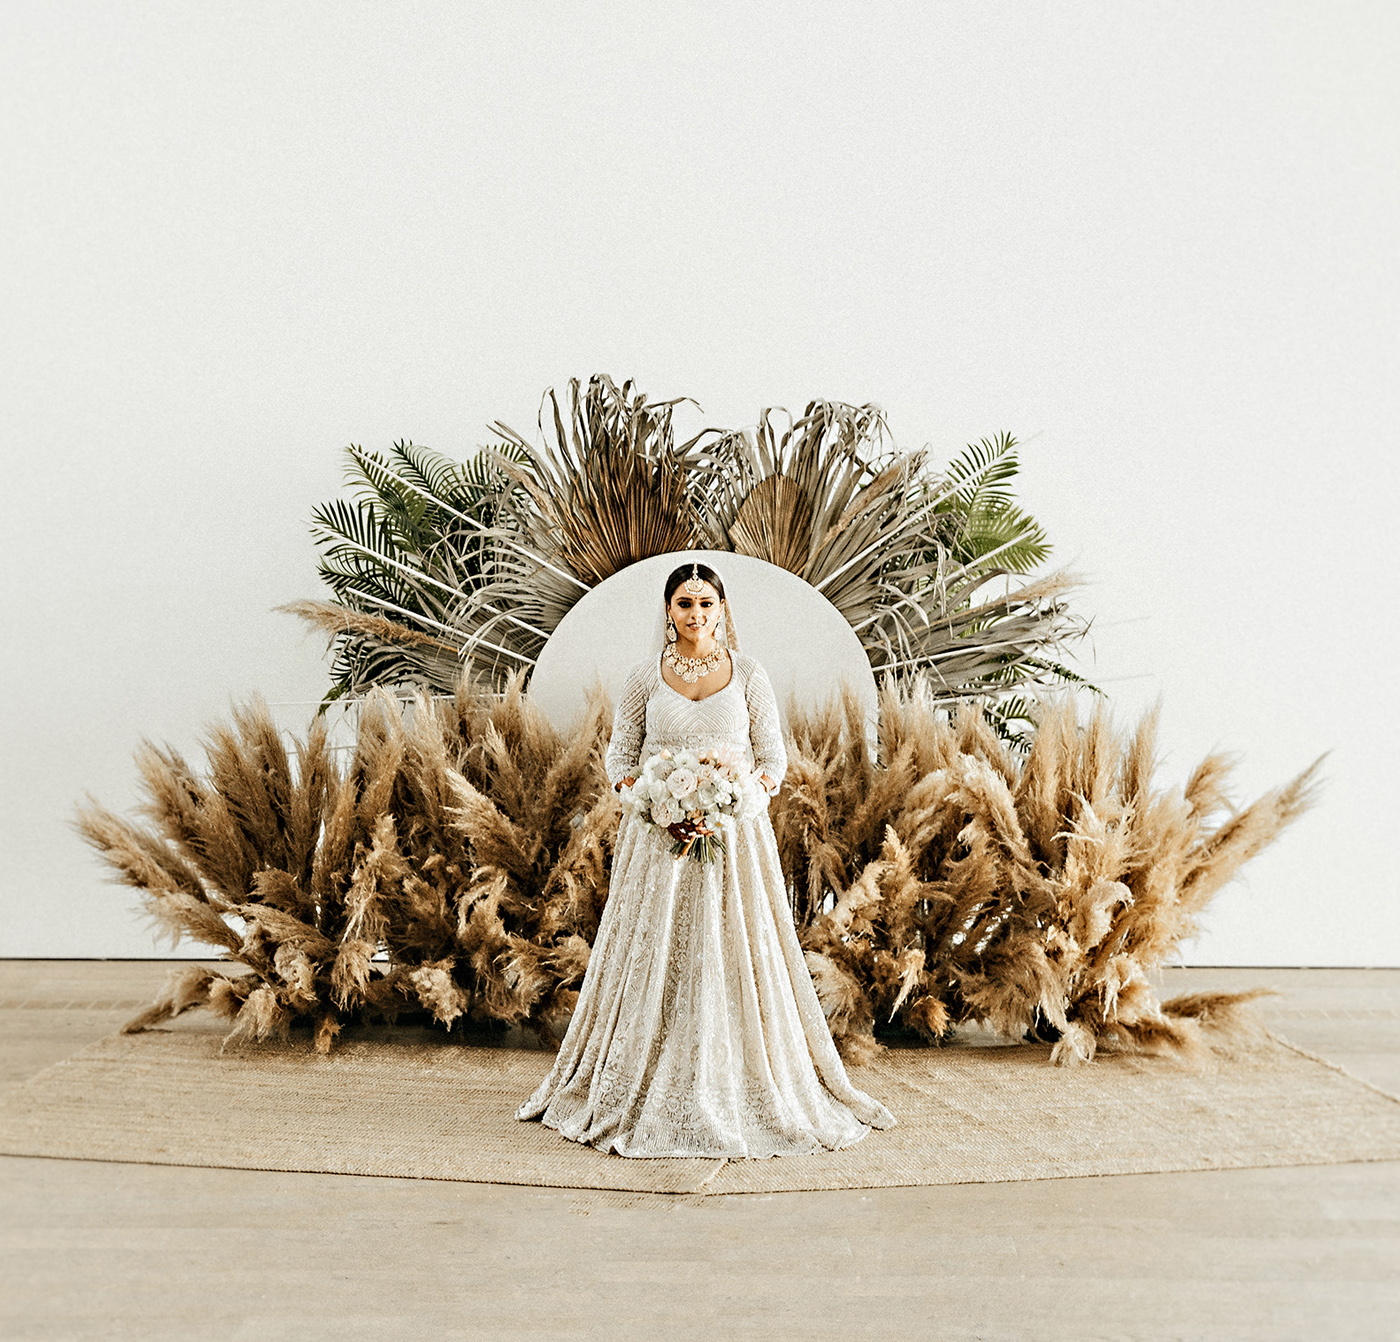 dried palms backdrop